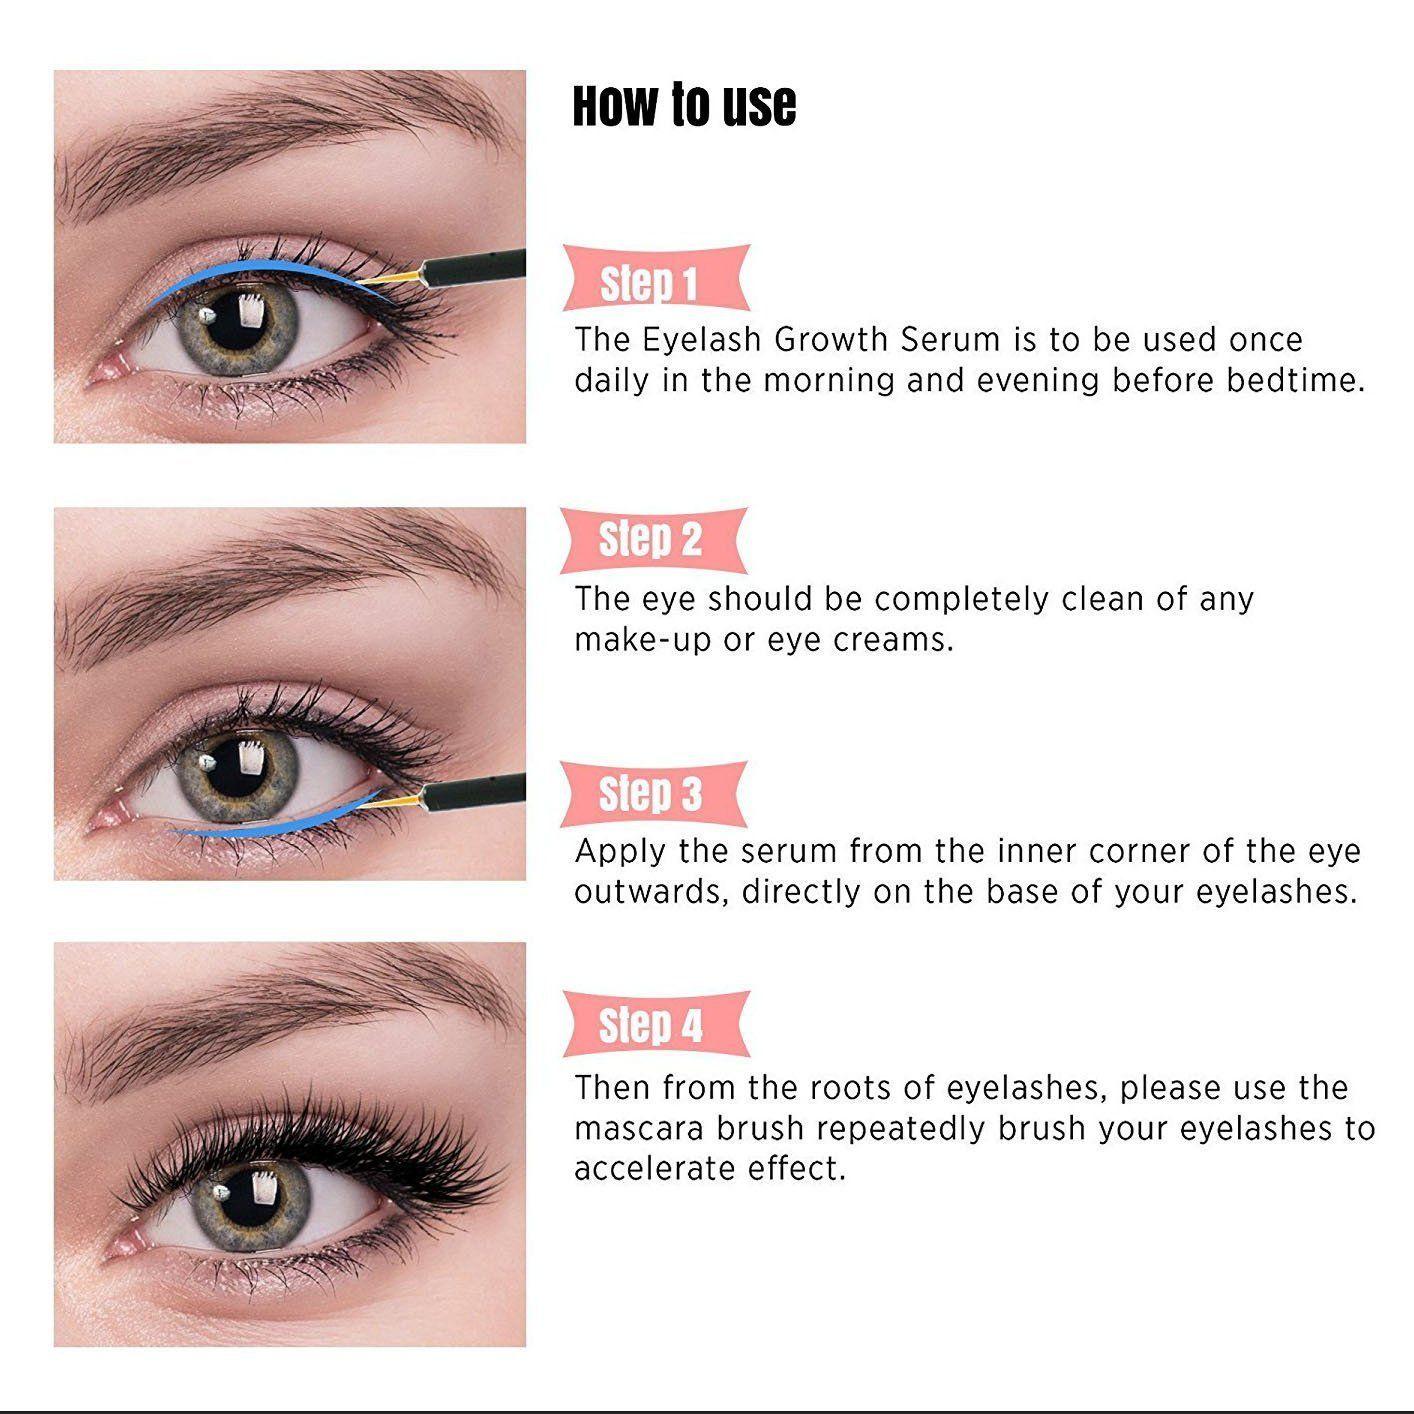 65d30f02479 Natural Eyelash & Eyebrow Growth Serum #inspireuplift #60DayMinimum  #ApplyToCleanEyebrows #BoostsEyebrowAndEyelashThickness #BoostsLashLength  ...